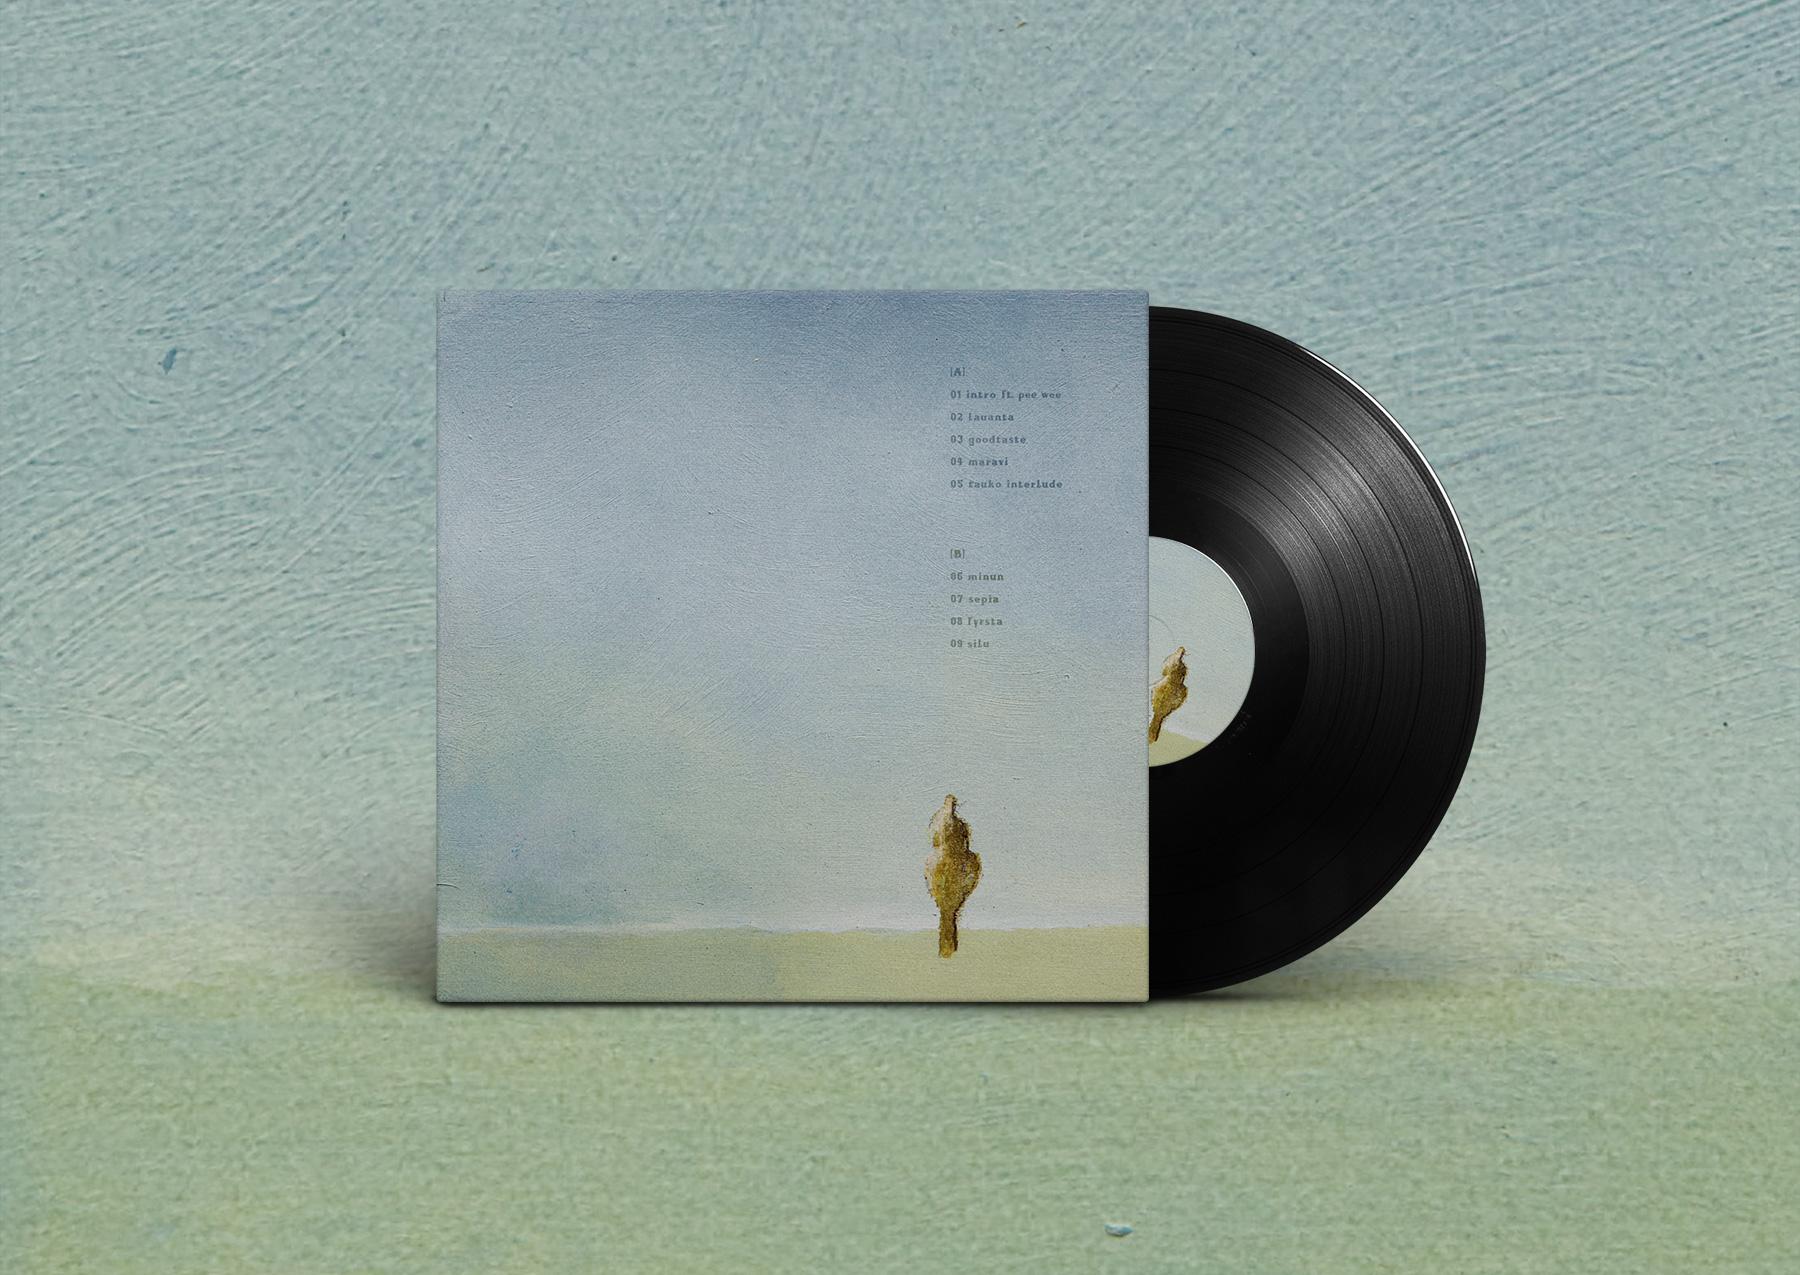 flughand-steichi-vinyl-nagutok-ep-typo-design-by-max-duchardt-ma-a-x-back